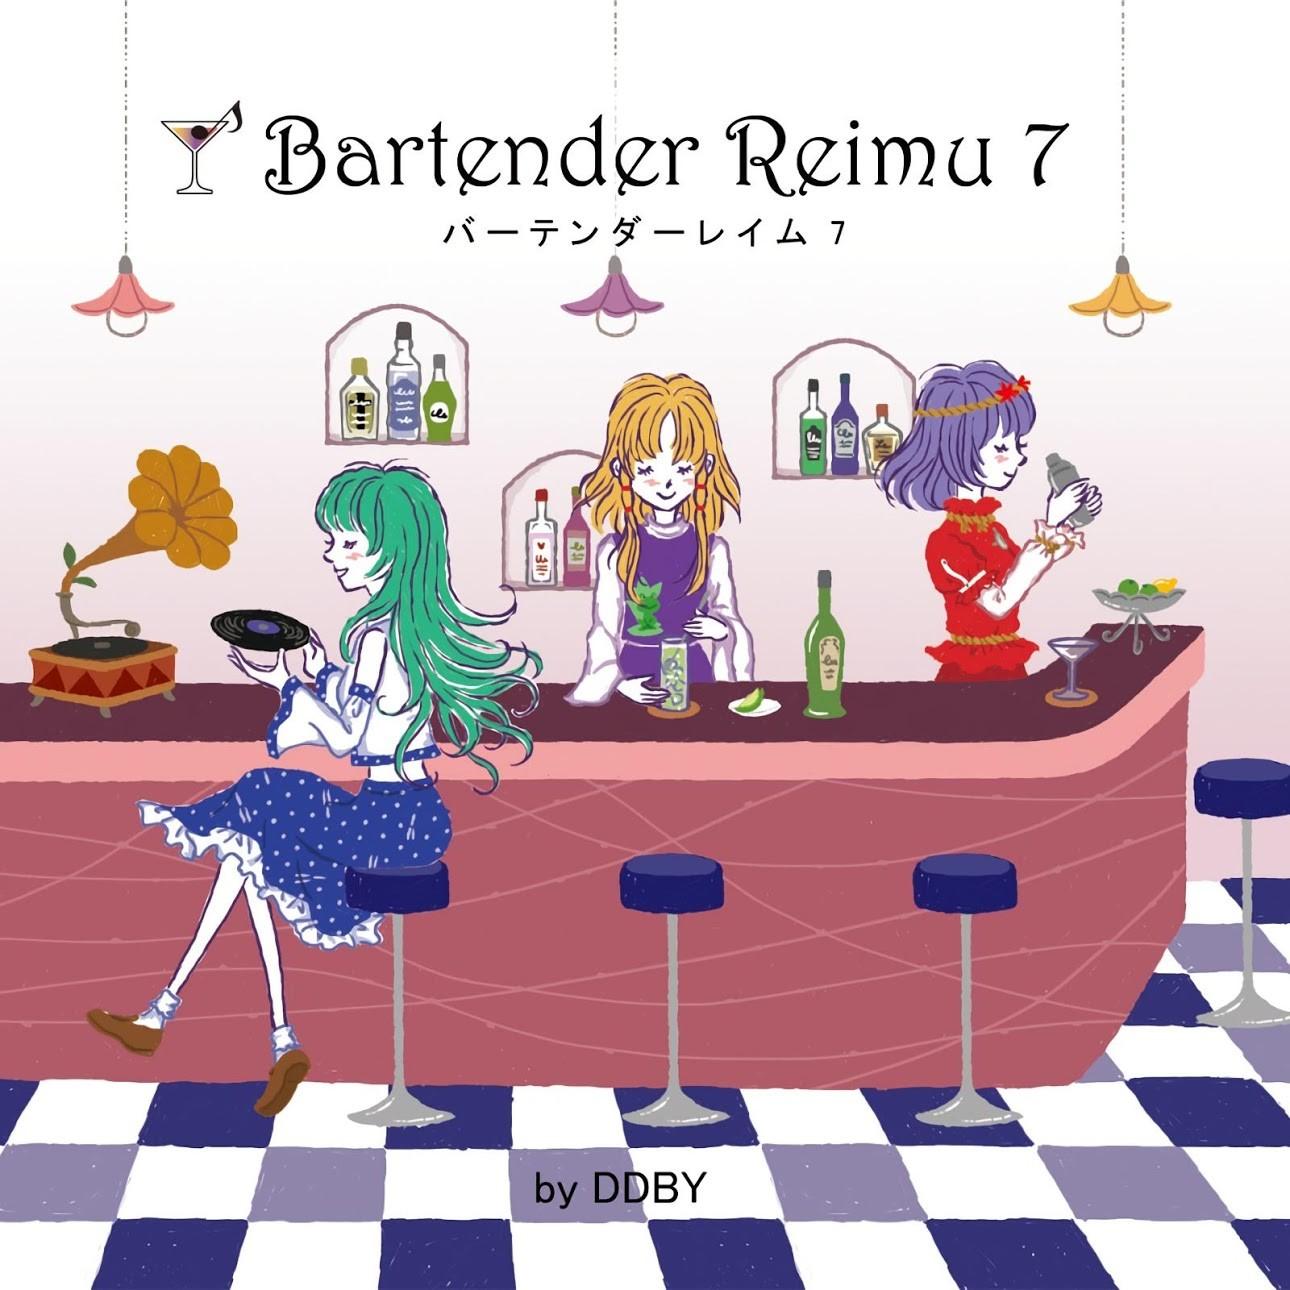 DDBY – Bartender Reimu 7 (バーテンダーレイム7) [FLAC + MP3 320 / CD] [2018.12.30]